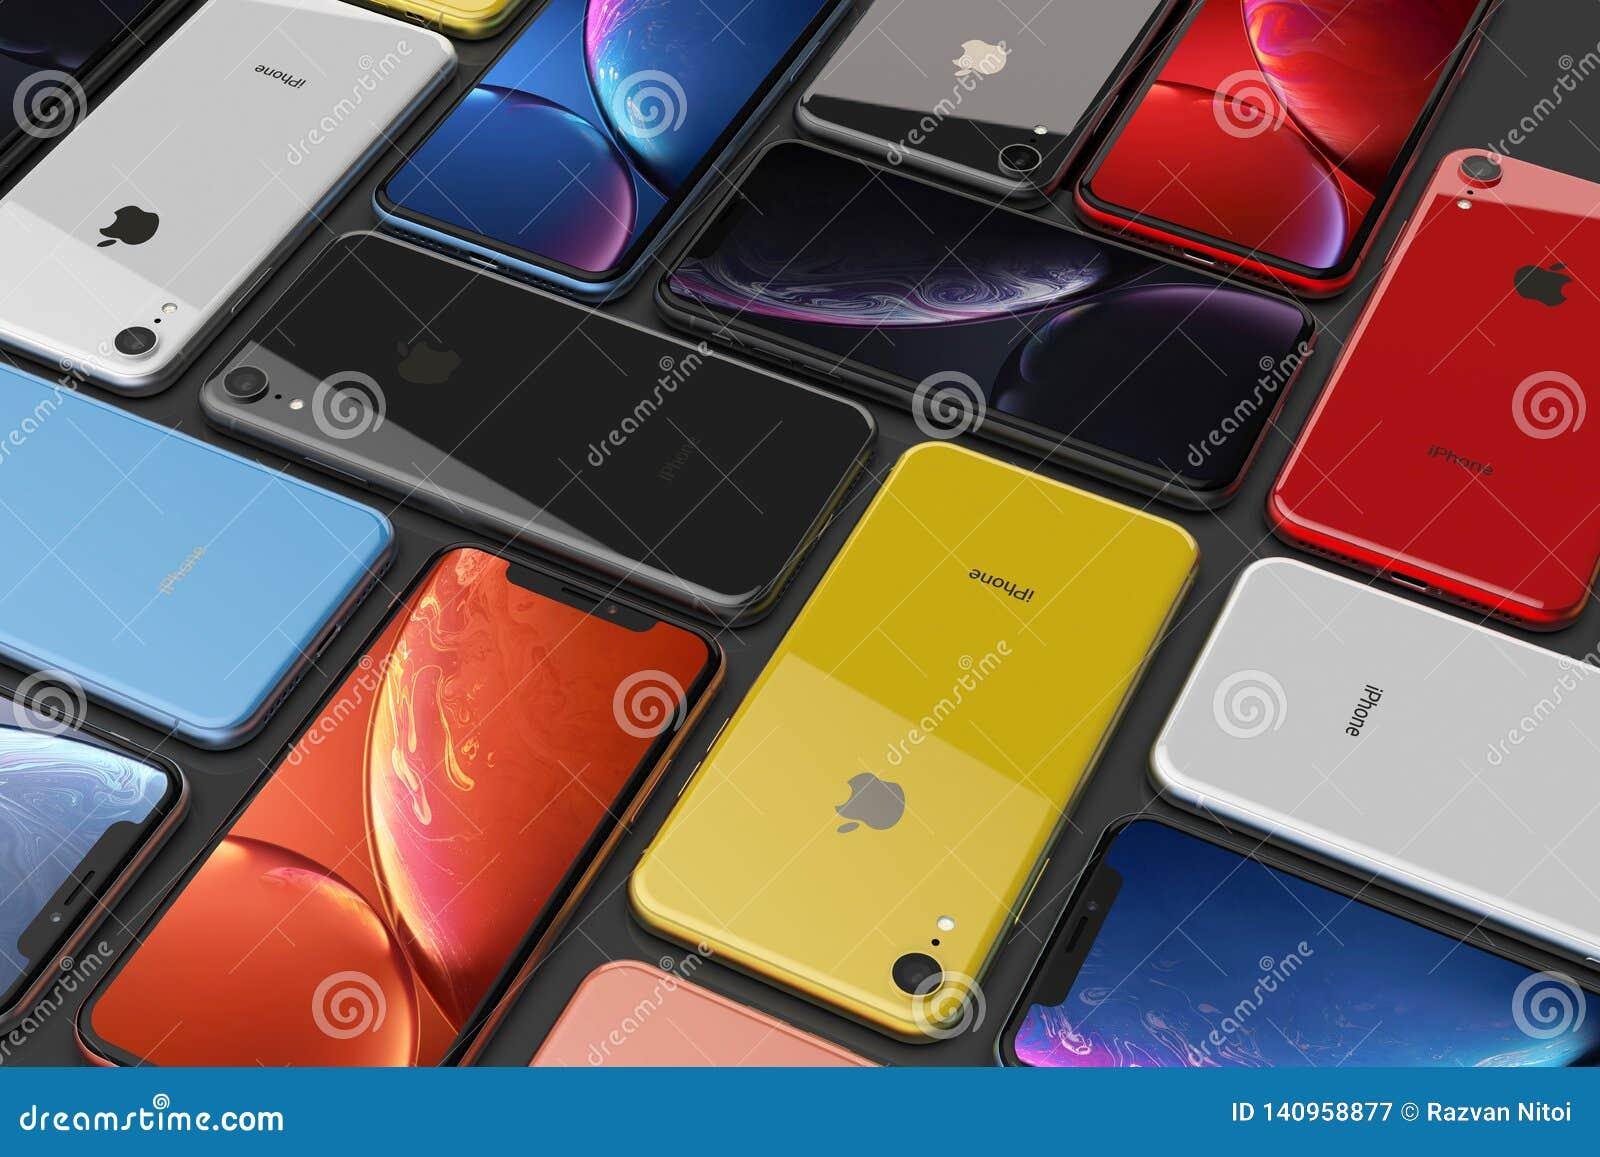 Apple Iphone Xr All Colours Mosaic Arrangement Original Wallpaper Editorial Photography Illustration Of Flash Digital 140958877